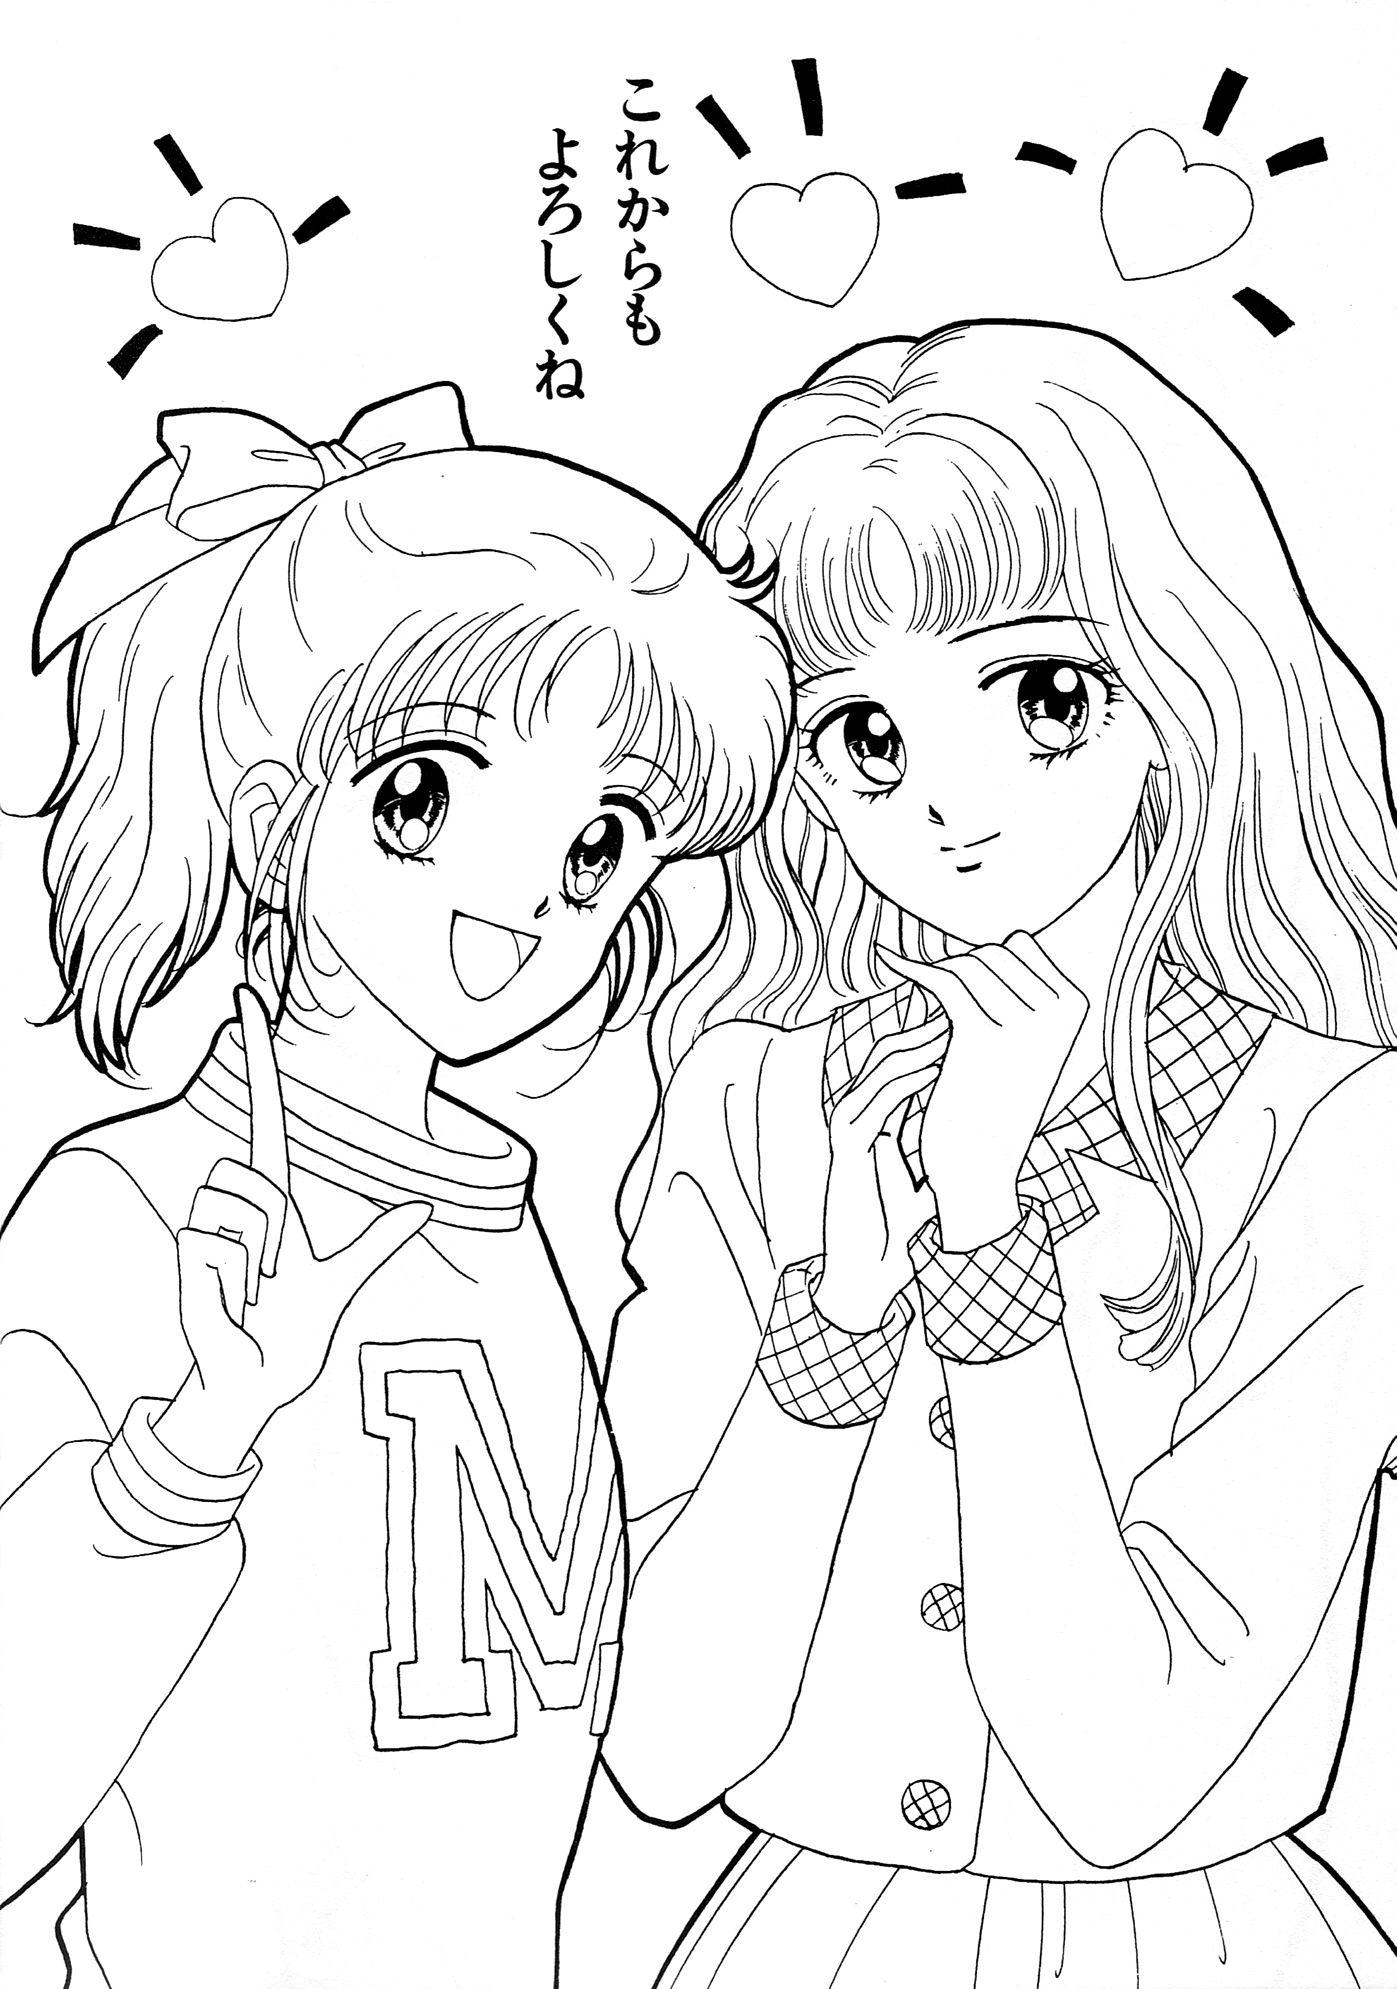 Pin De My Info En Anime Shojou Y Shonen Dibujos Cupido Dibujo